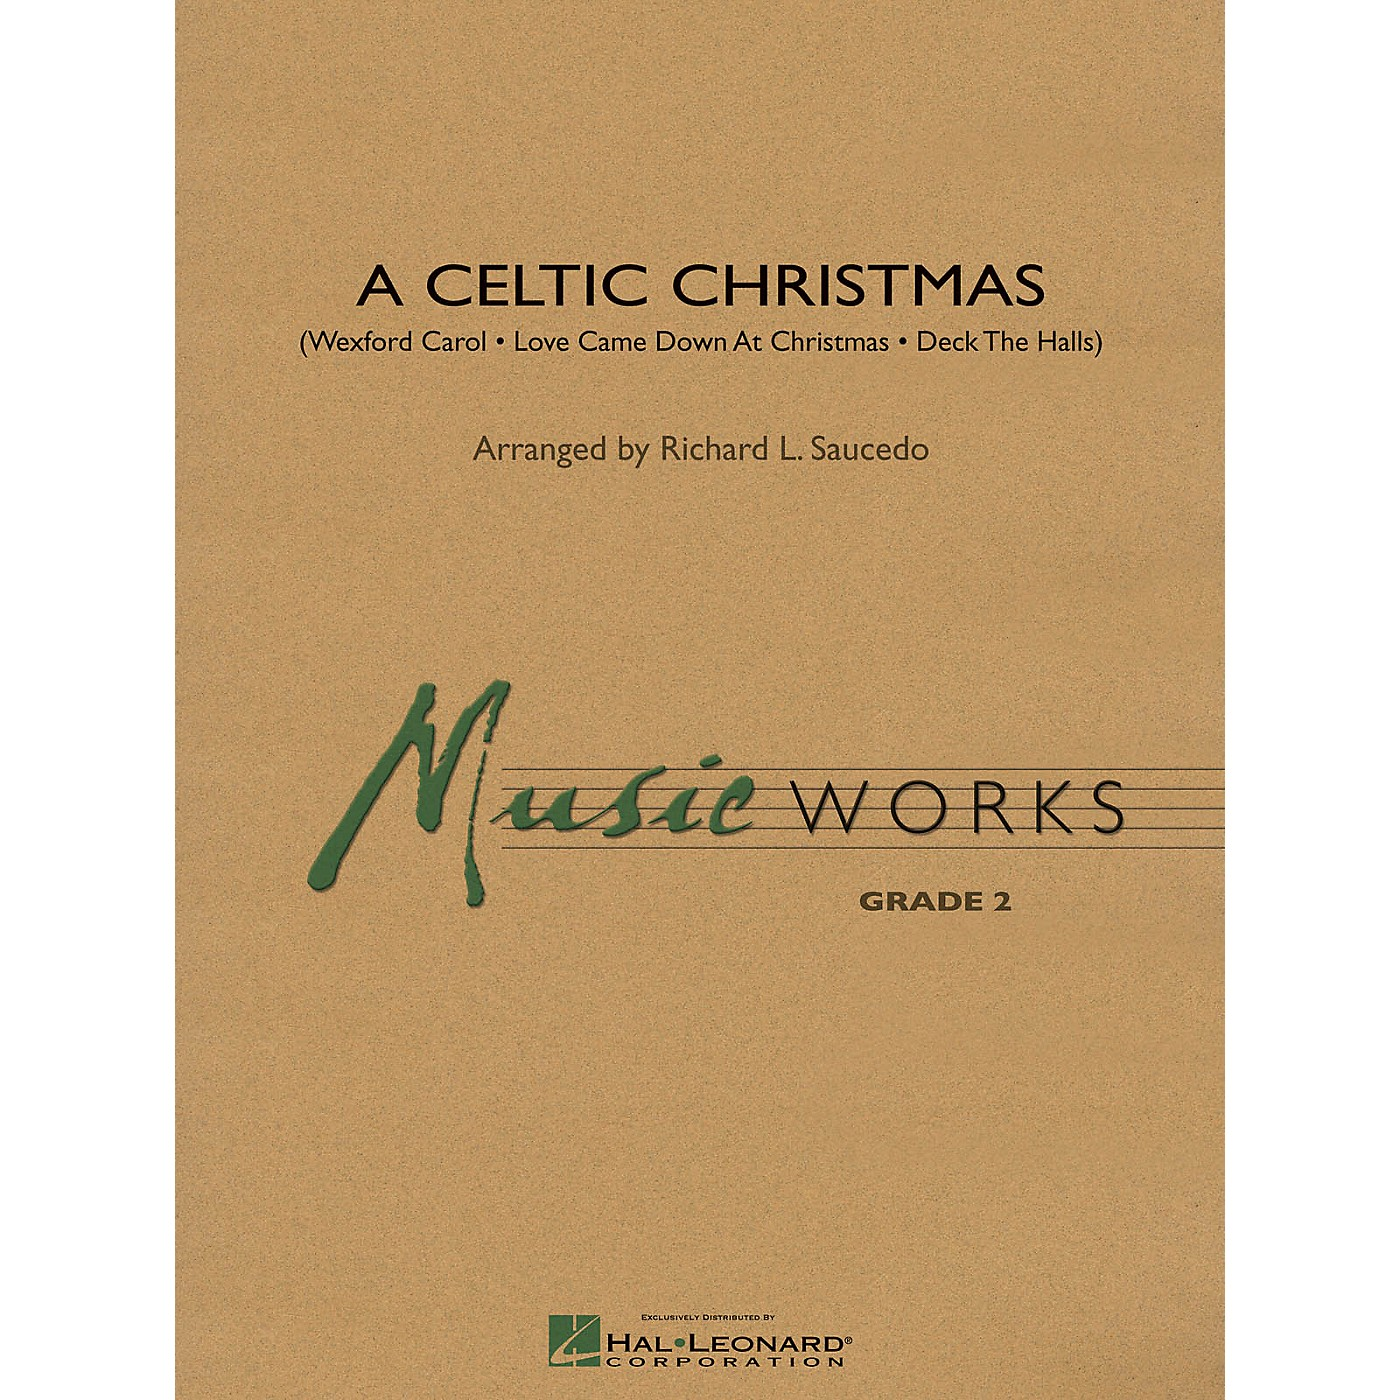 Hal Leonard A Celtic Christmas Concert Band Level 2 Arranged by Richard L. Saucedo thumbnail